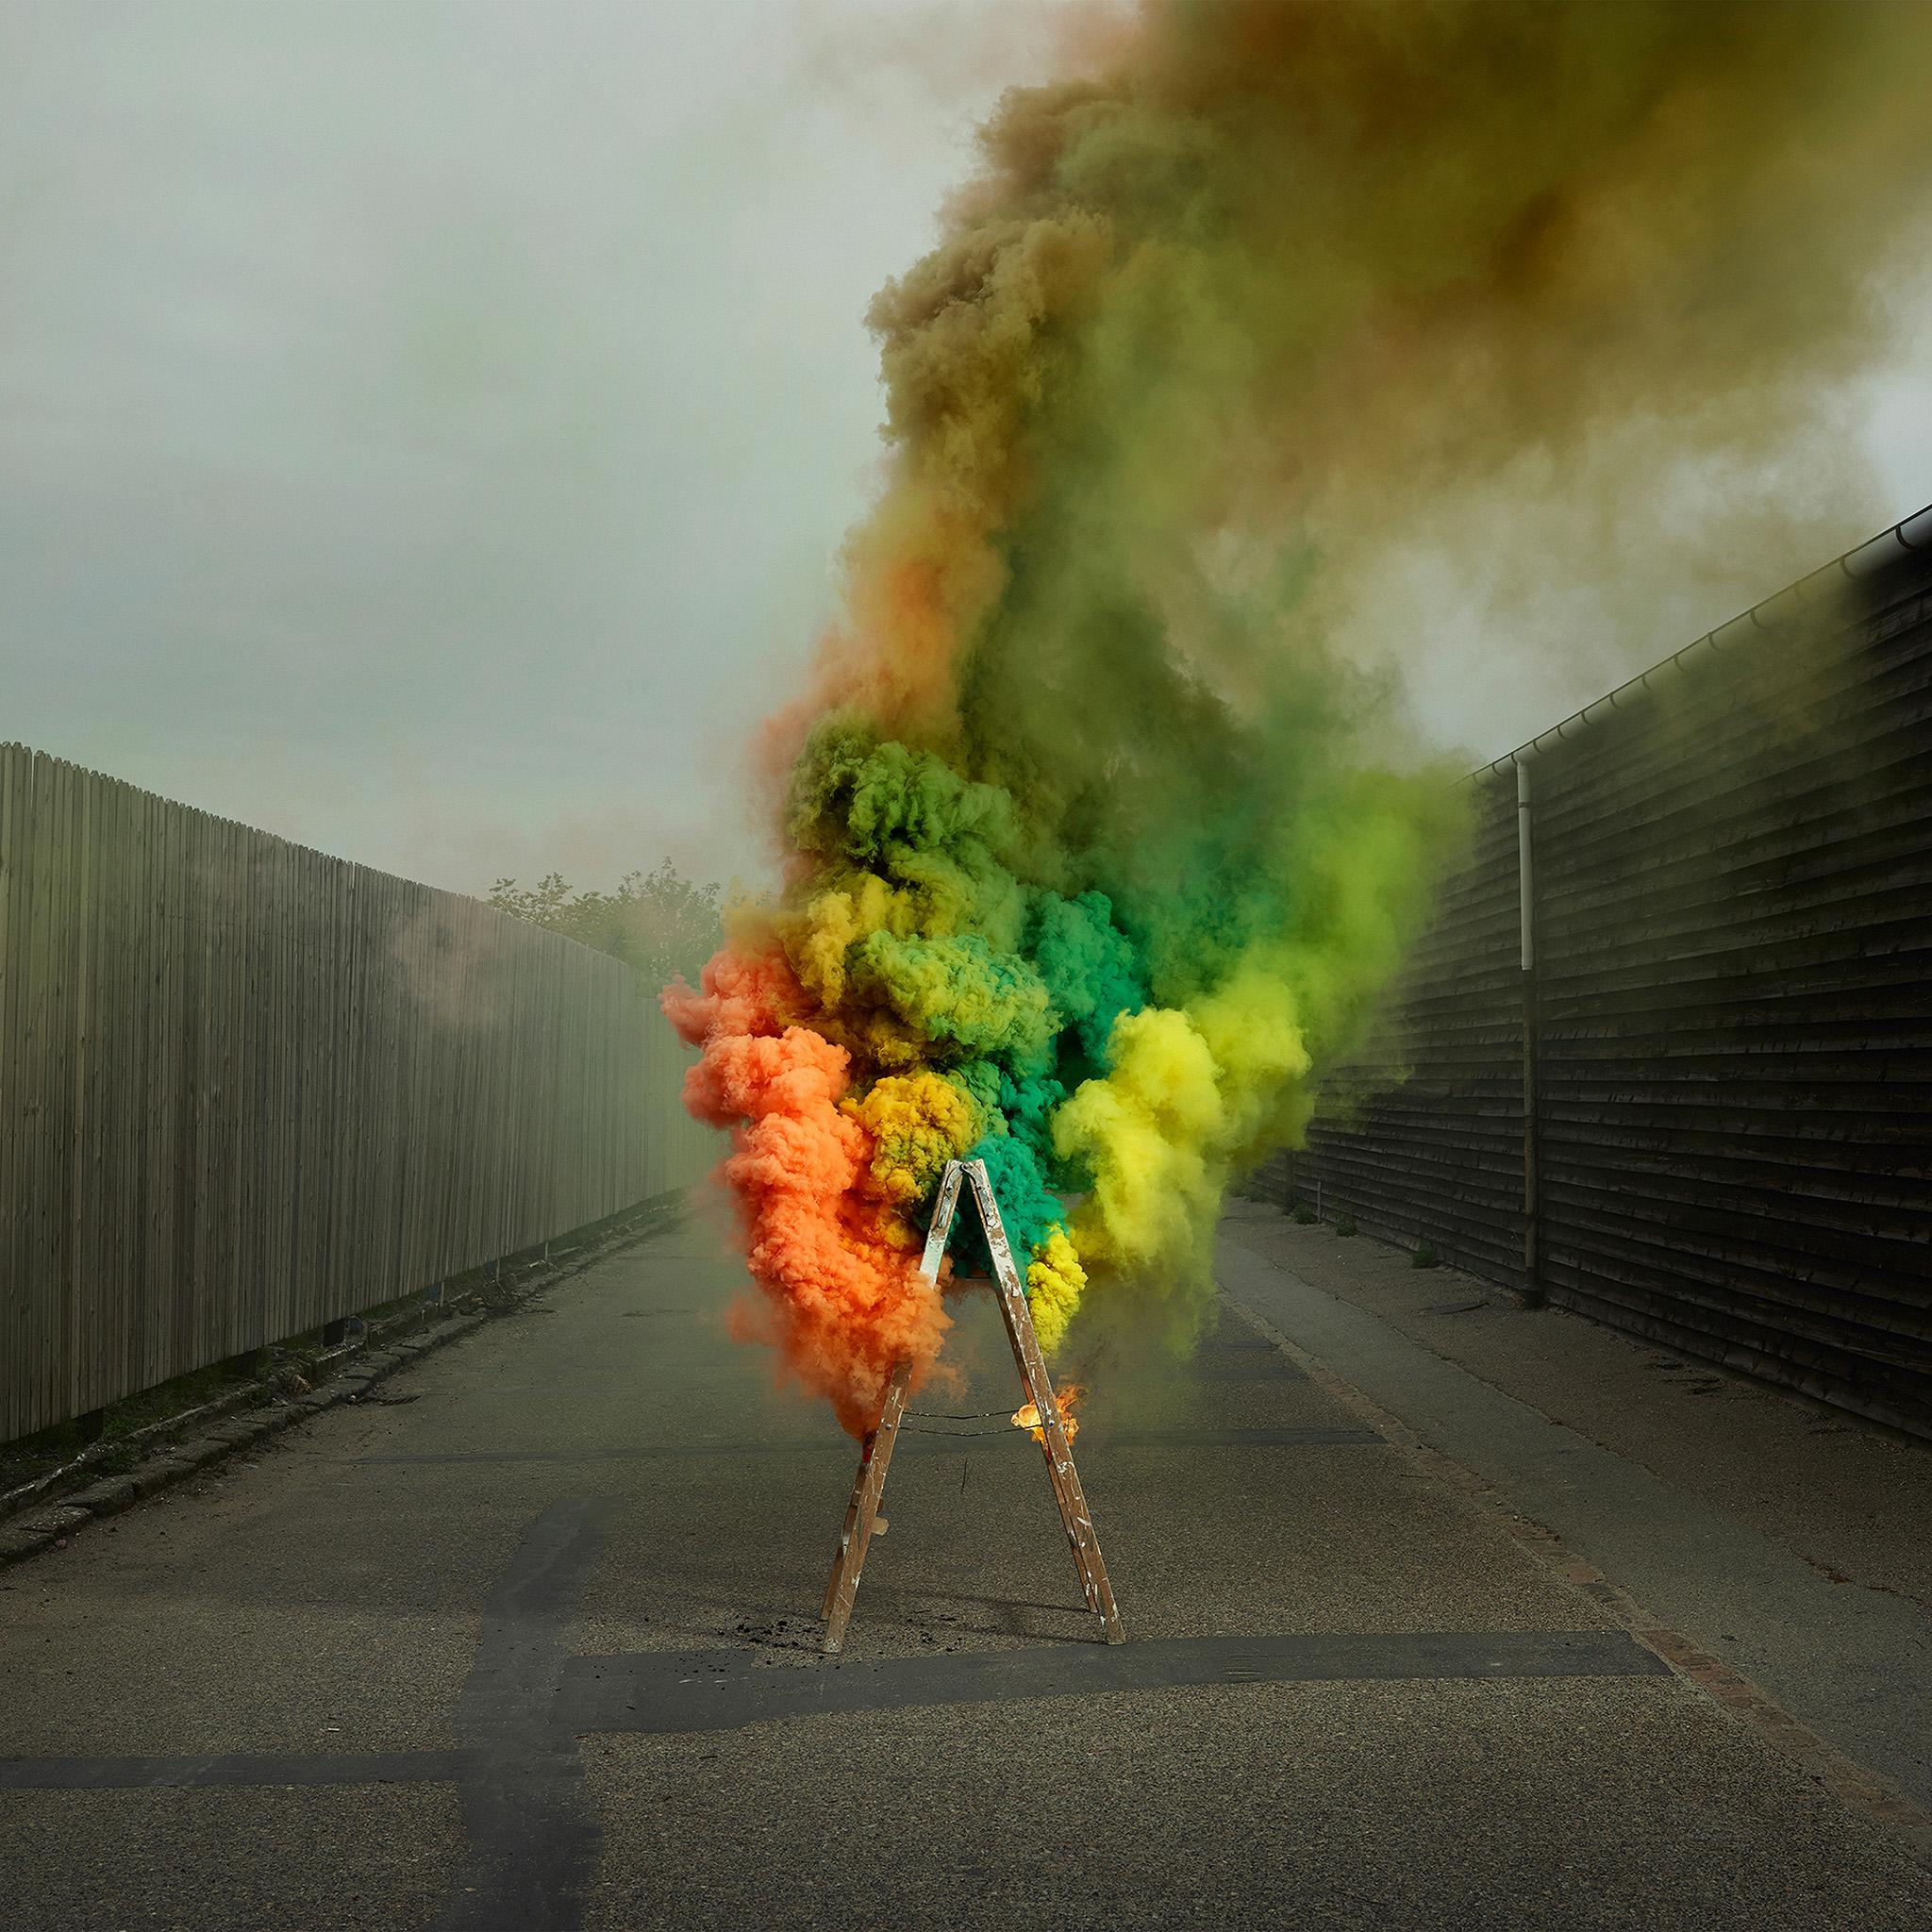 ba14-smog-fire-color-rainbow-illustration-art-wallpaper